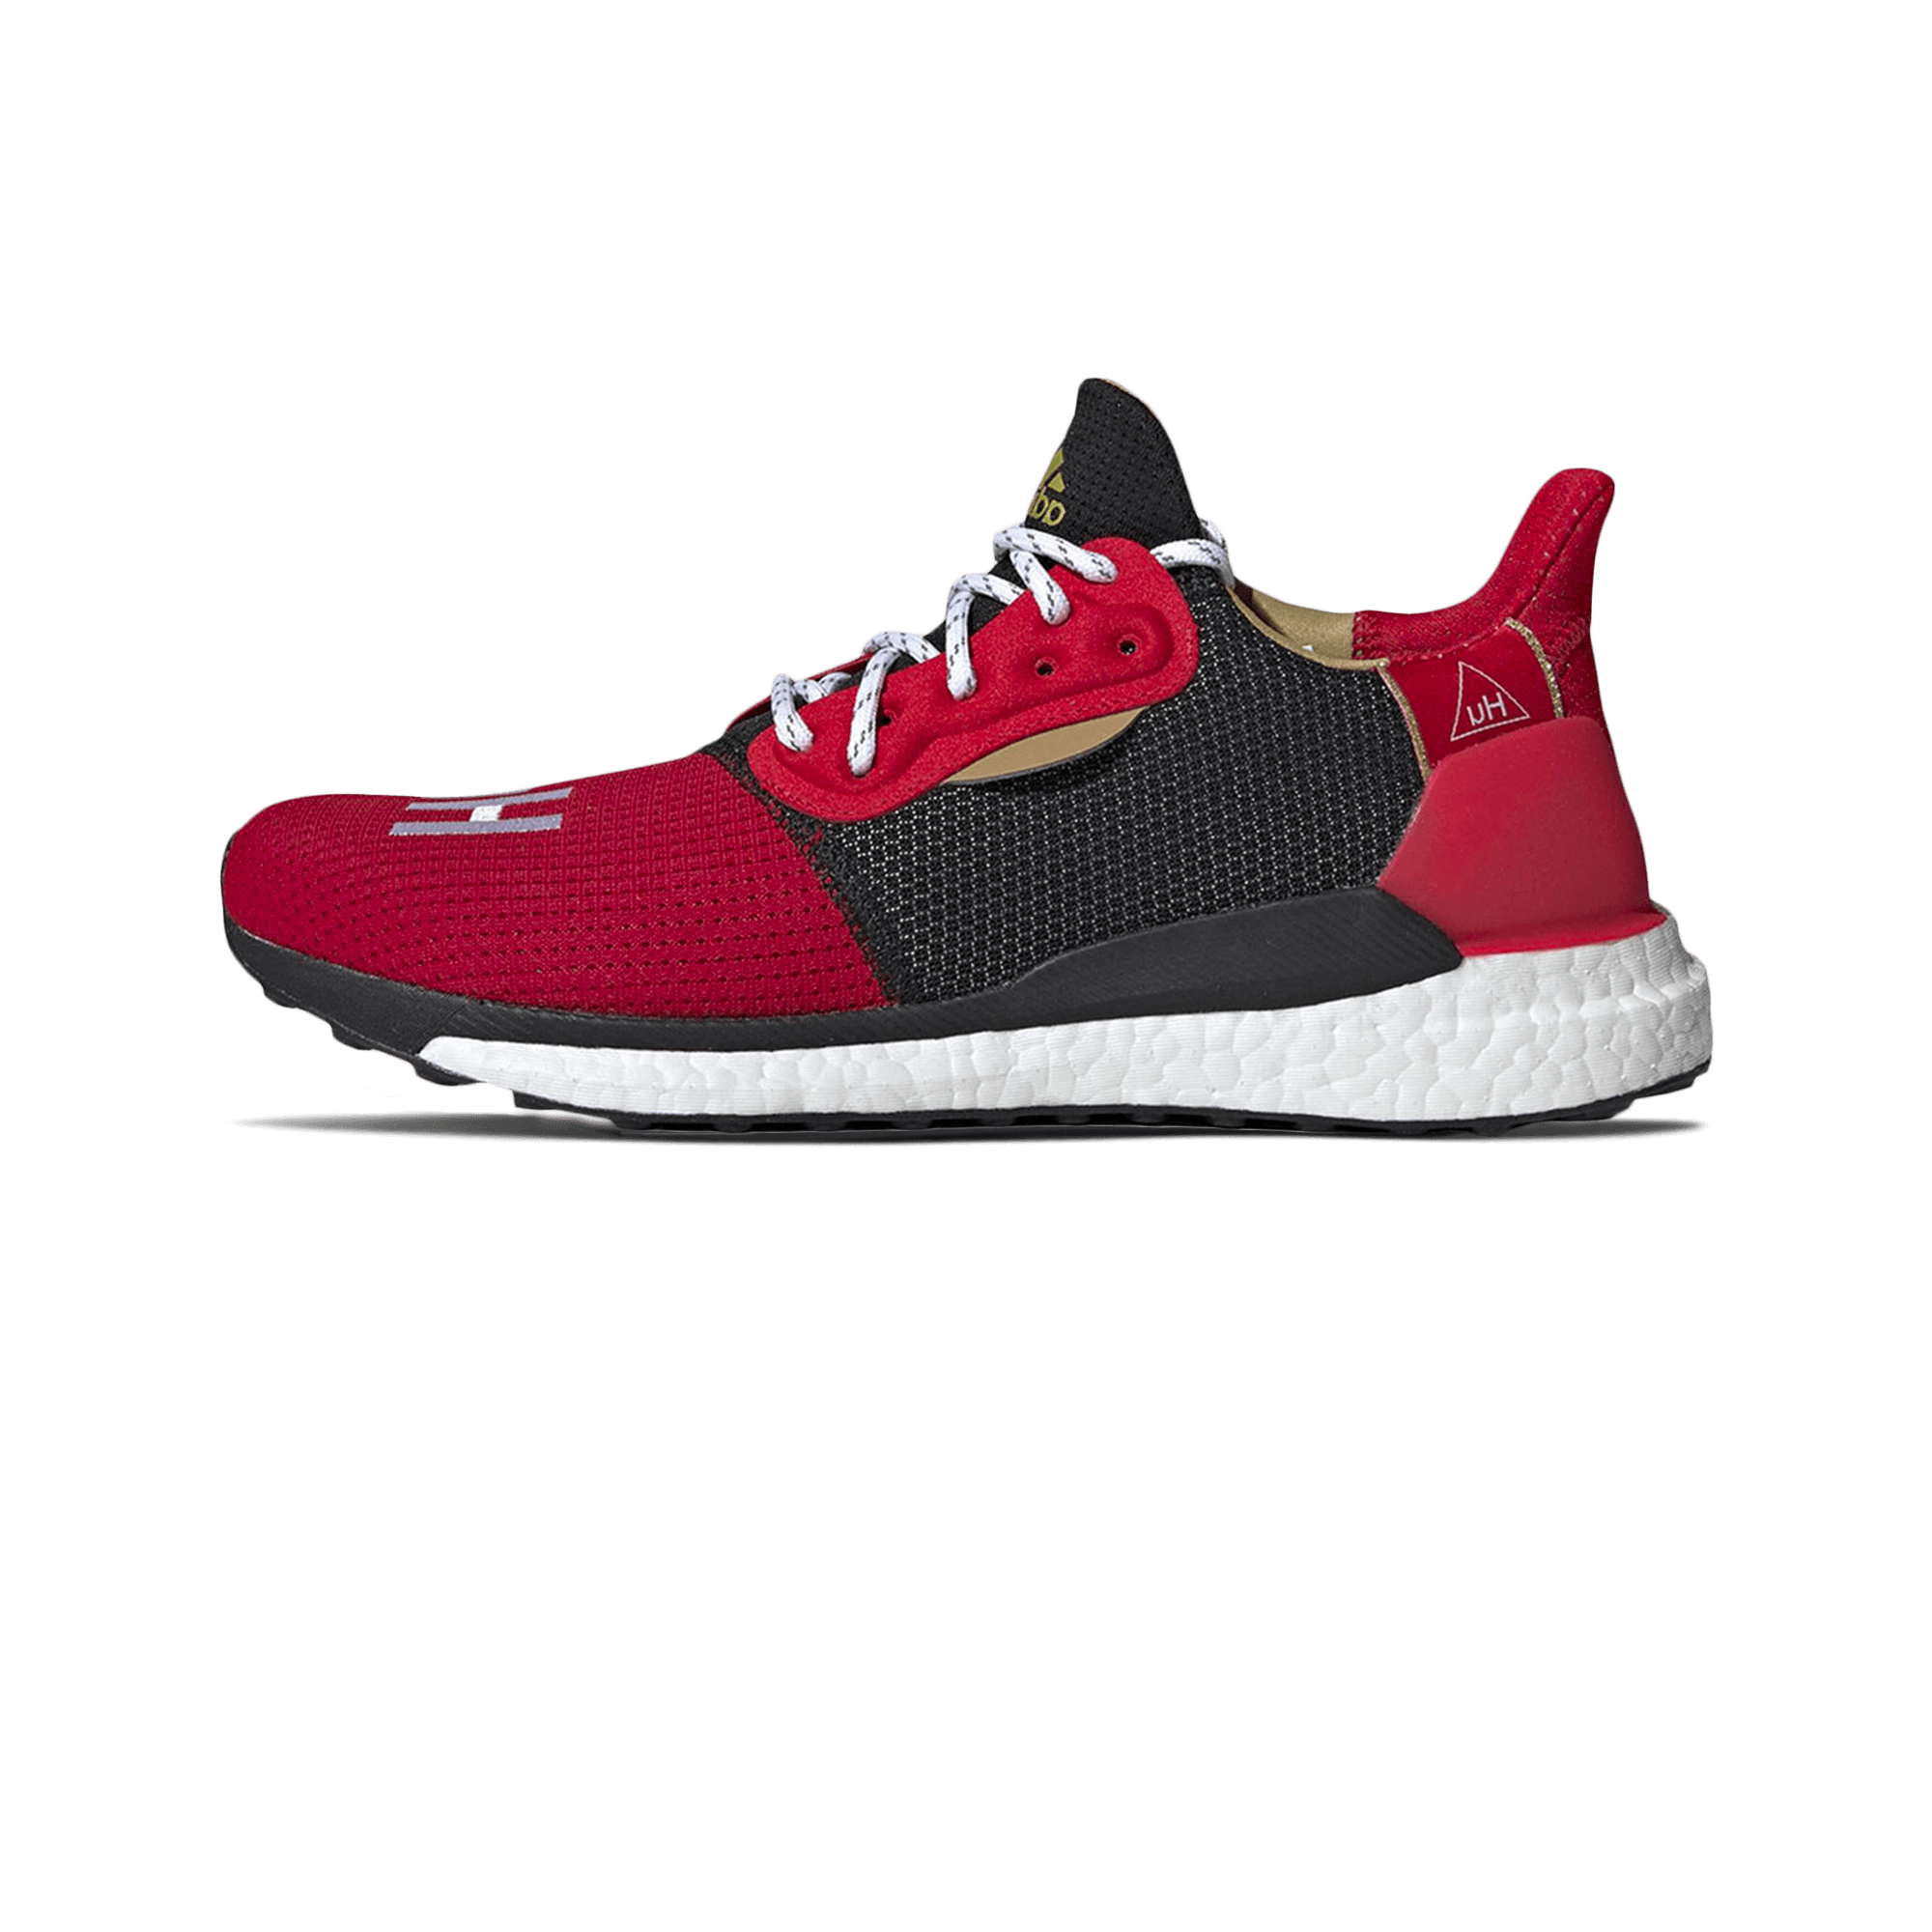 adidas pharrell williams red- OFF 51